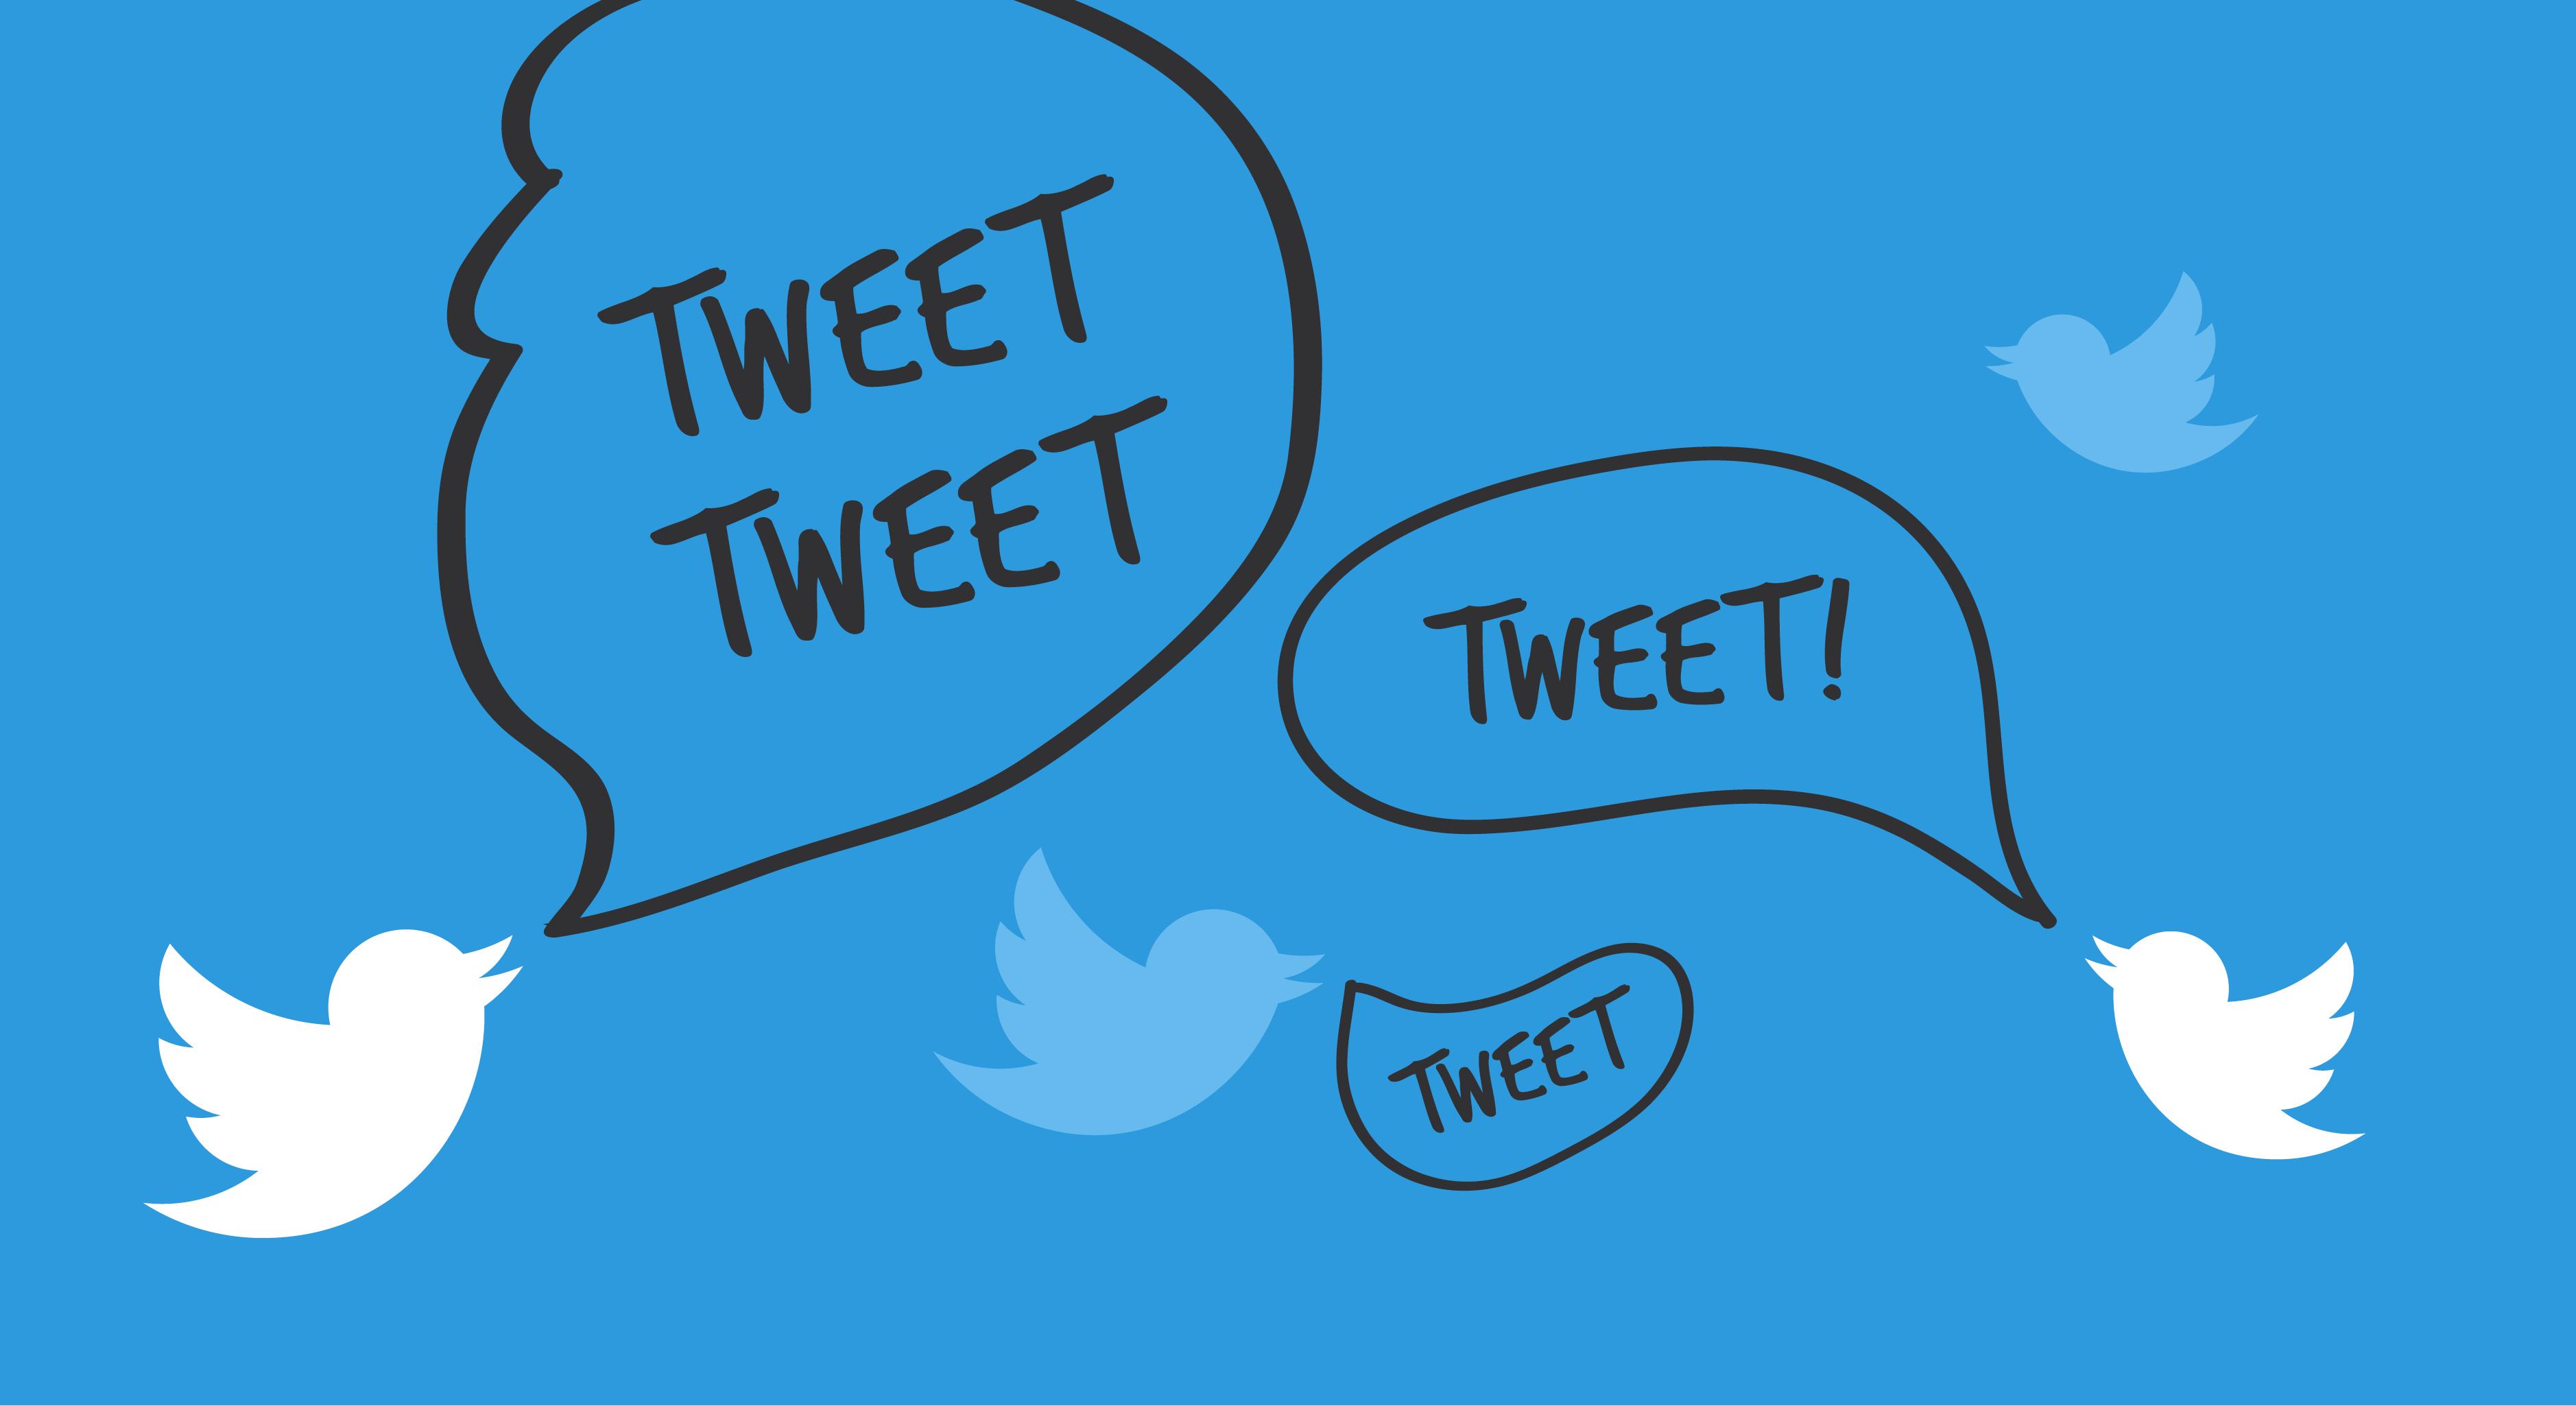 Send Tweet | Know Your Meme